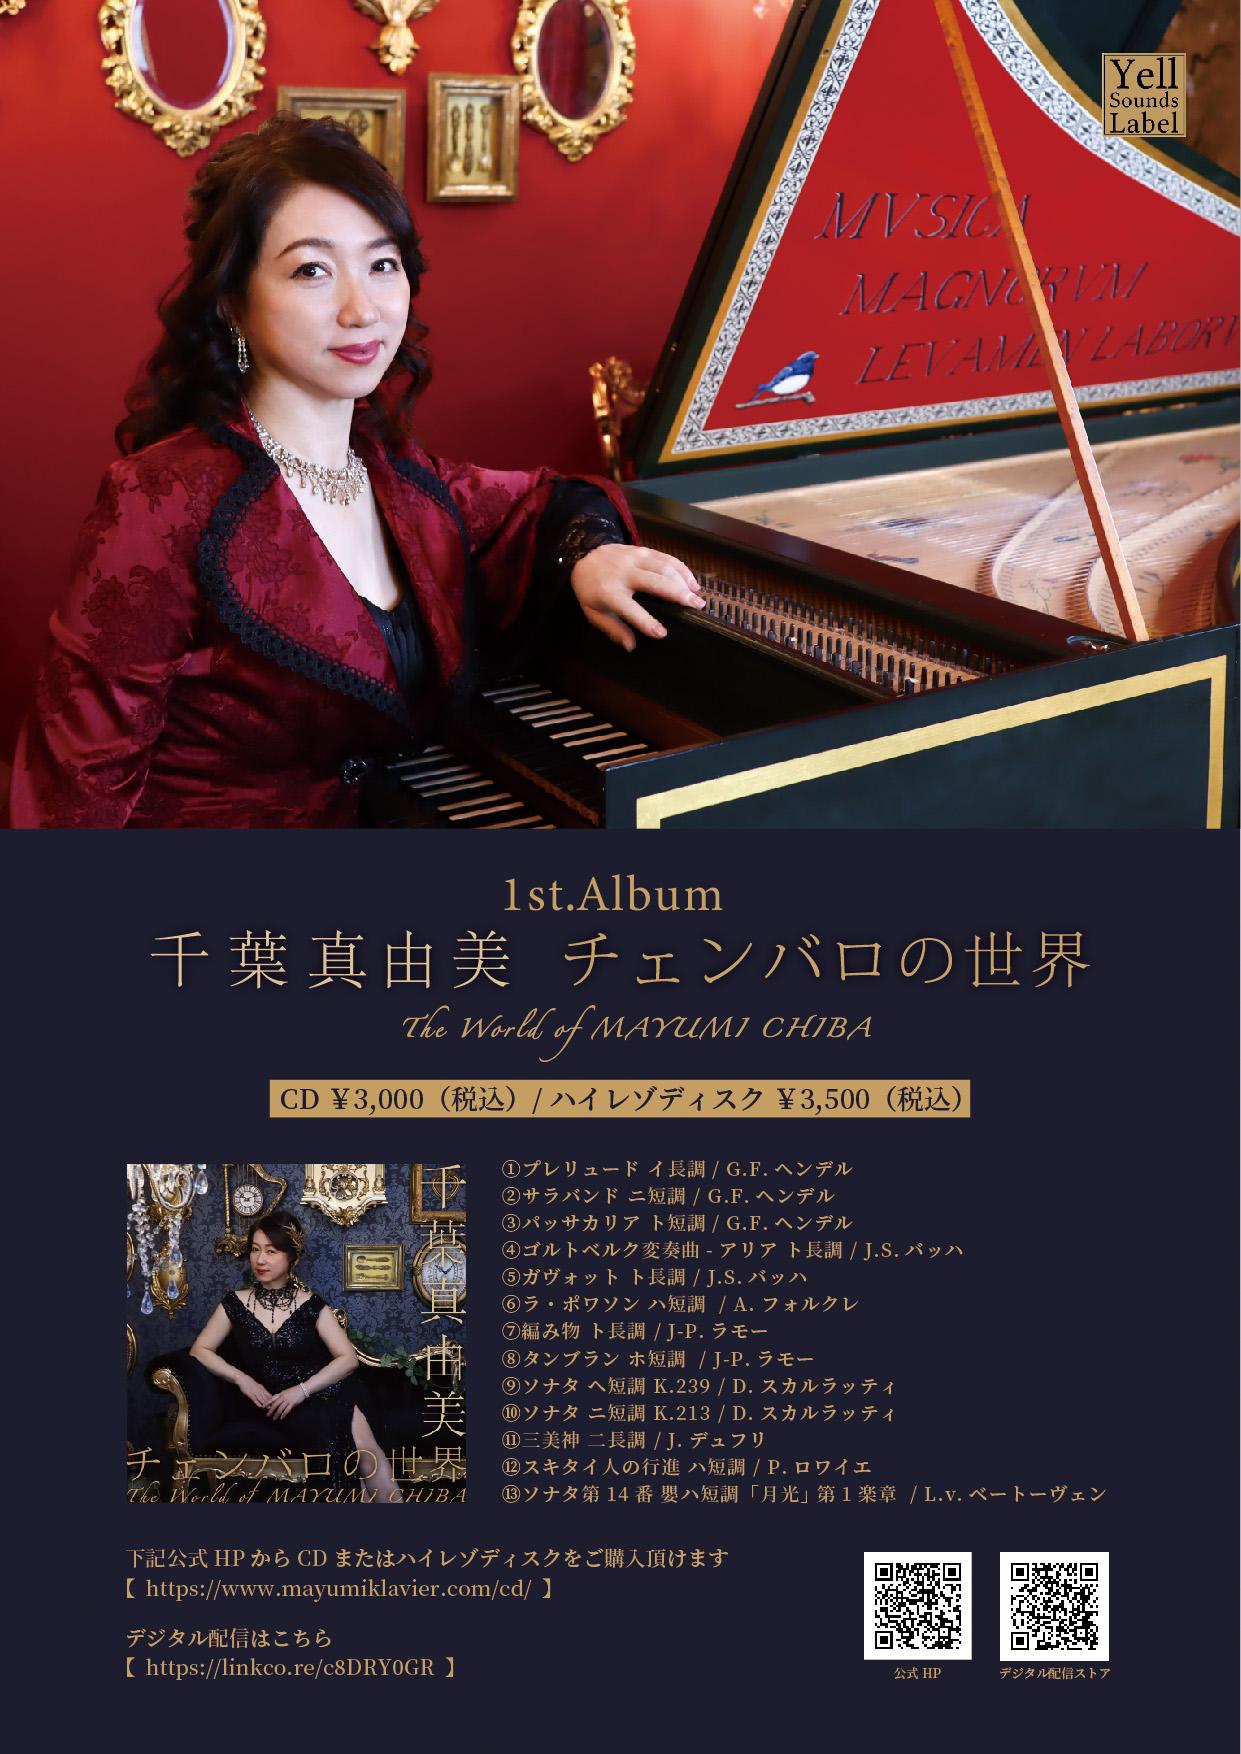 1st.アルバム 千葉真由美チェンバロの世界